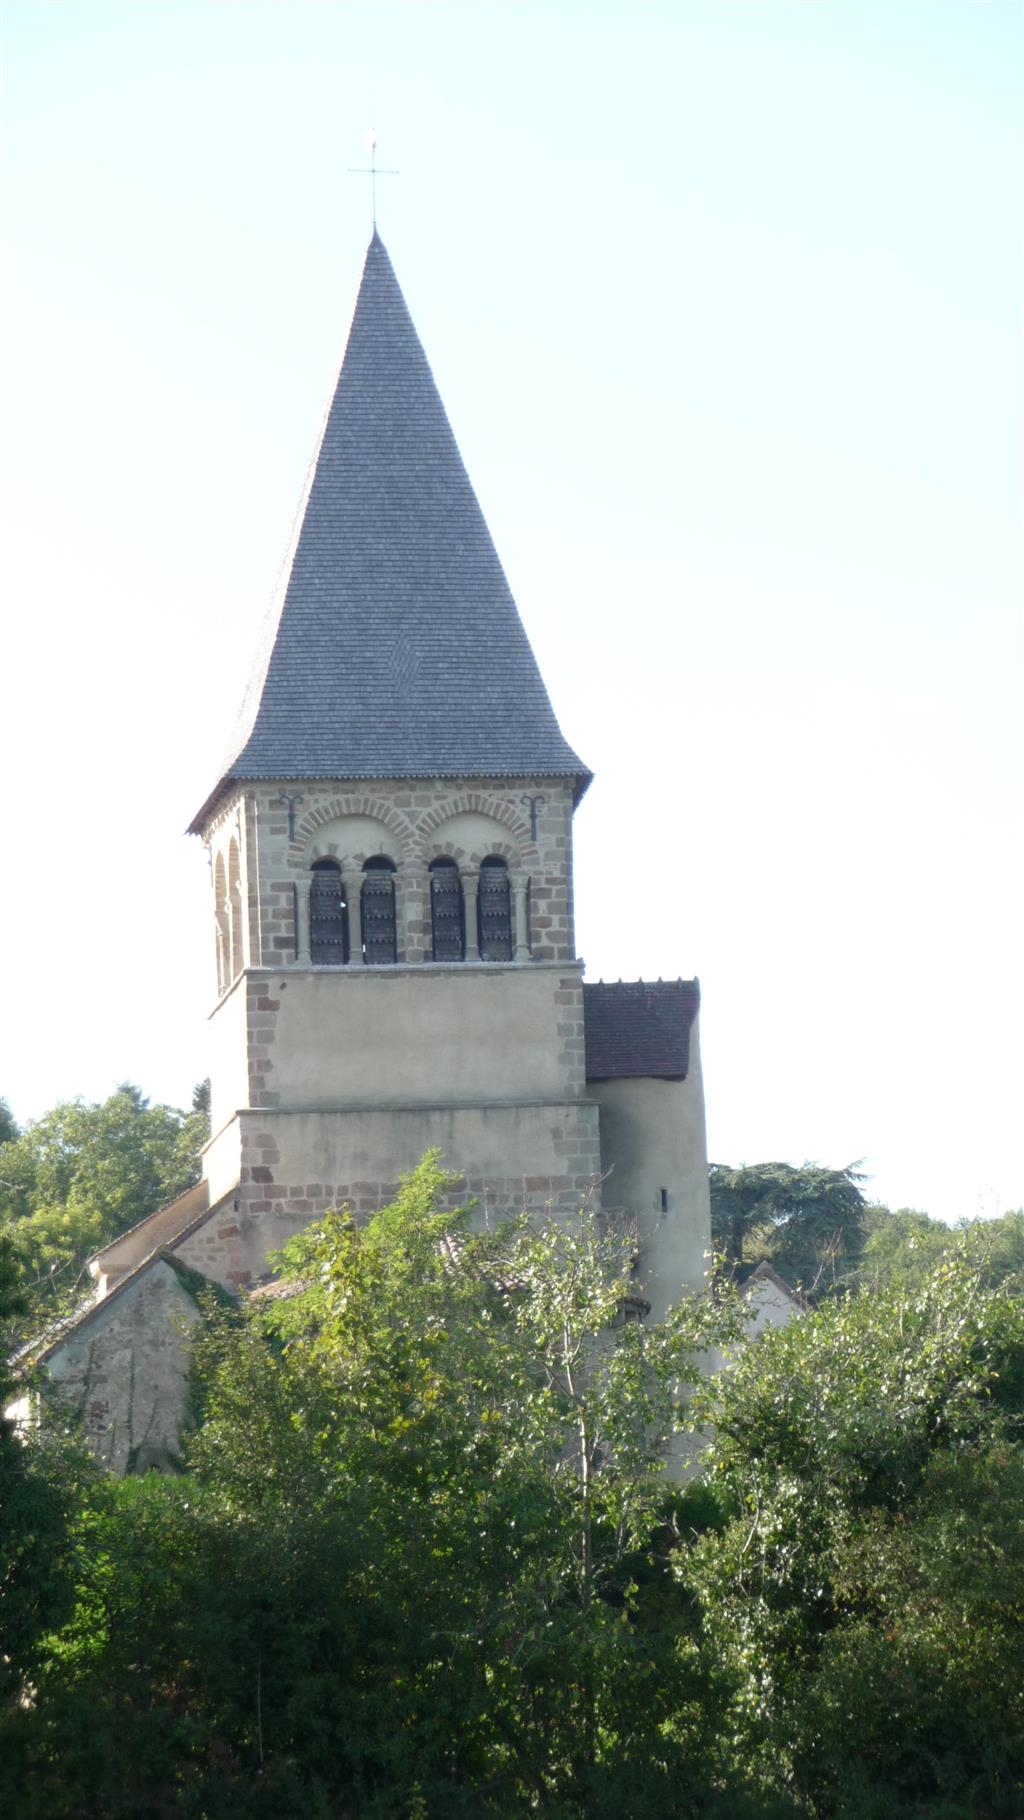 Église Saint-Pierre - Theneuille Clocher Ⓒ Mairie Theneuille